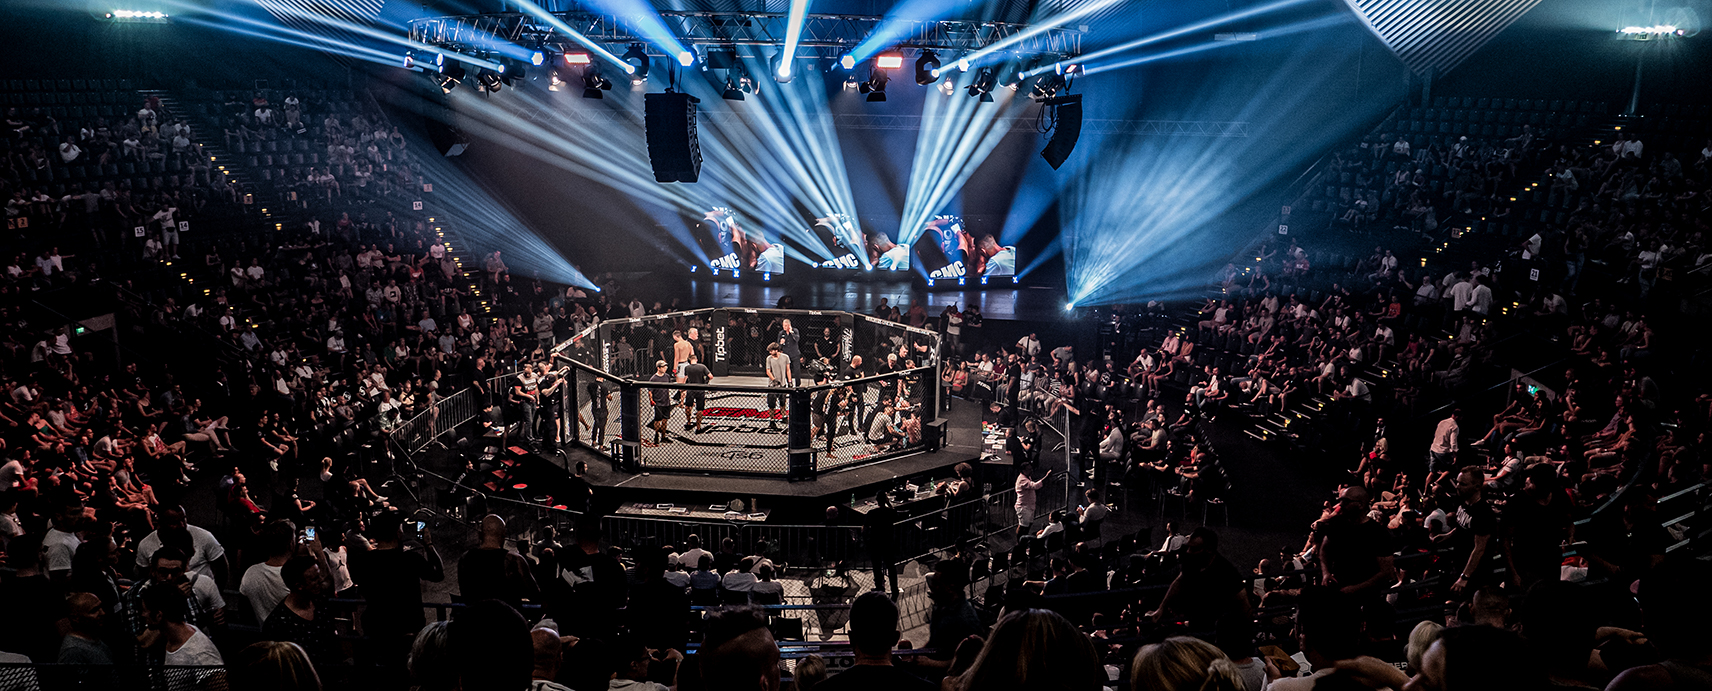 German MMA Championsship GMC, FEFLOGX Sportswear, Octagon, MMA-Cage, Ranfighting.